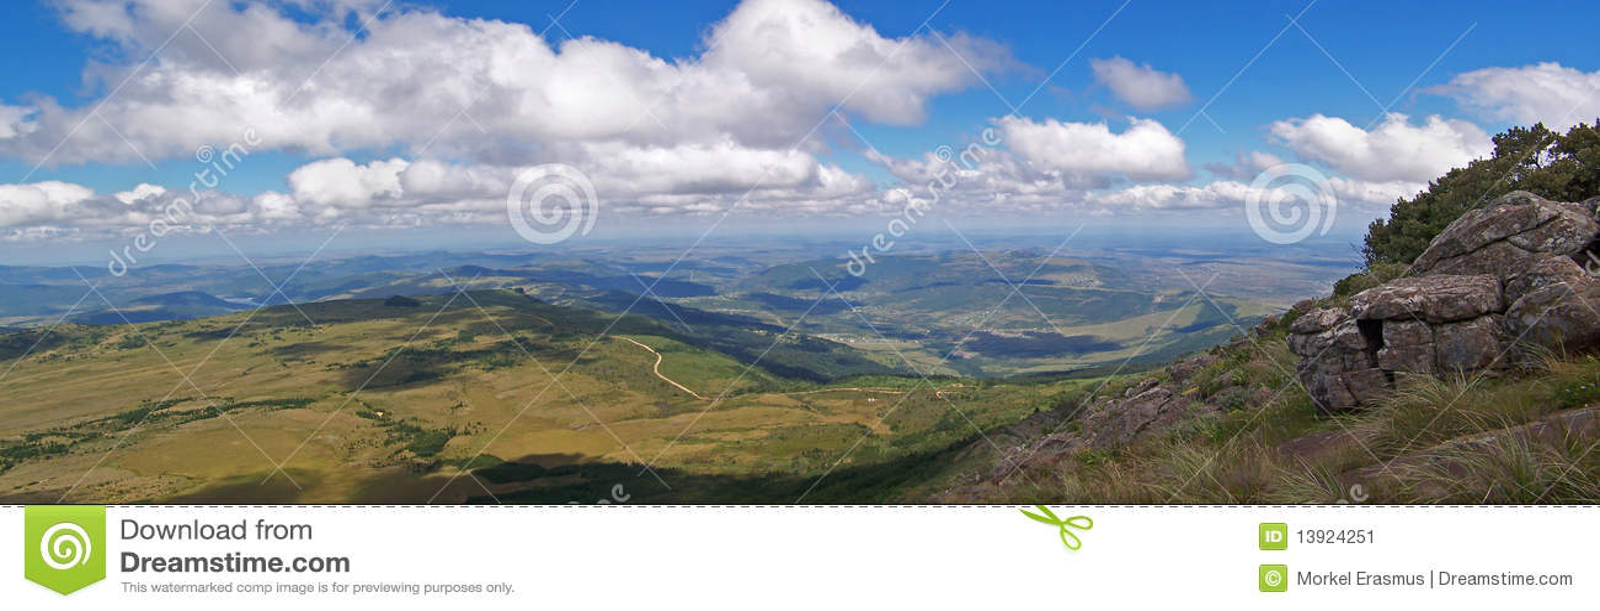 Panoramic Amatola Vista